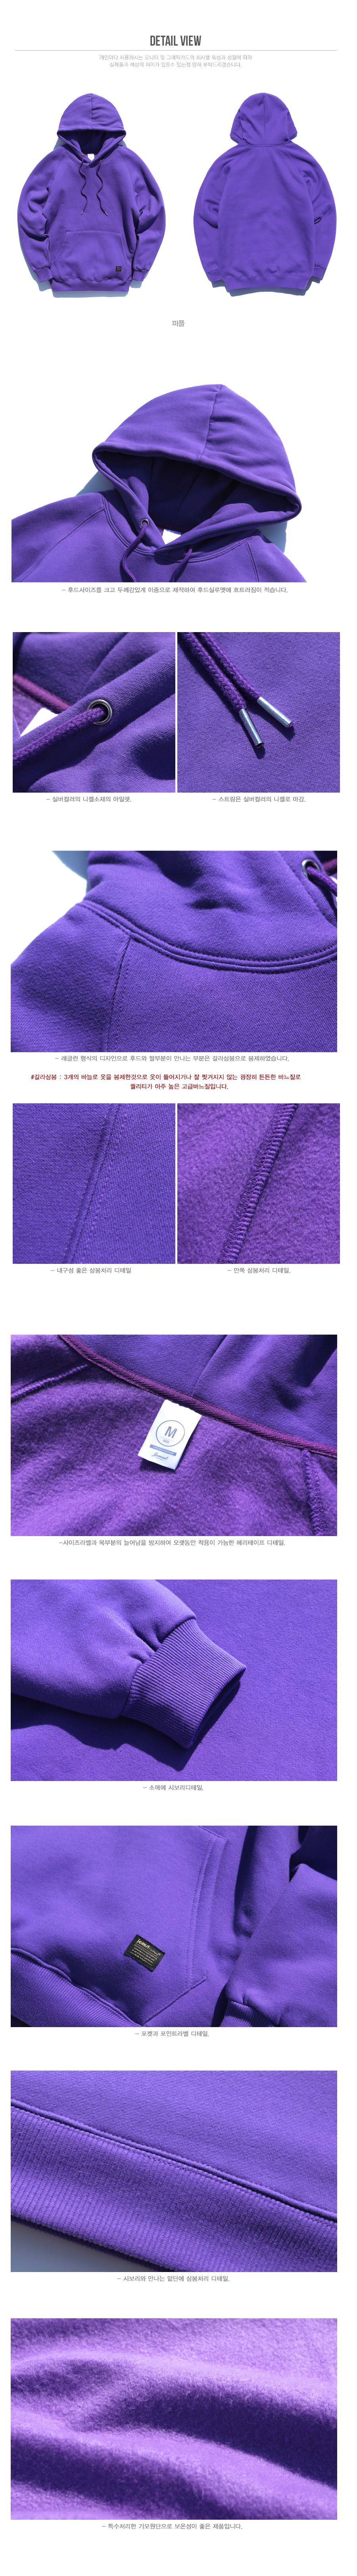 20151117_jwin_hood_purple_kj.jpg